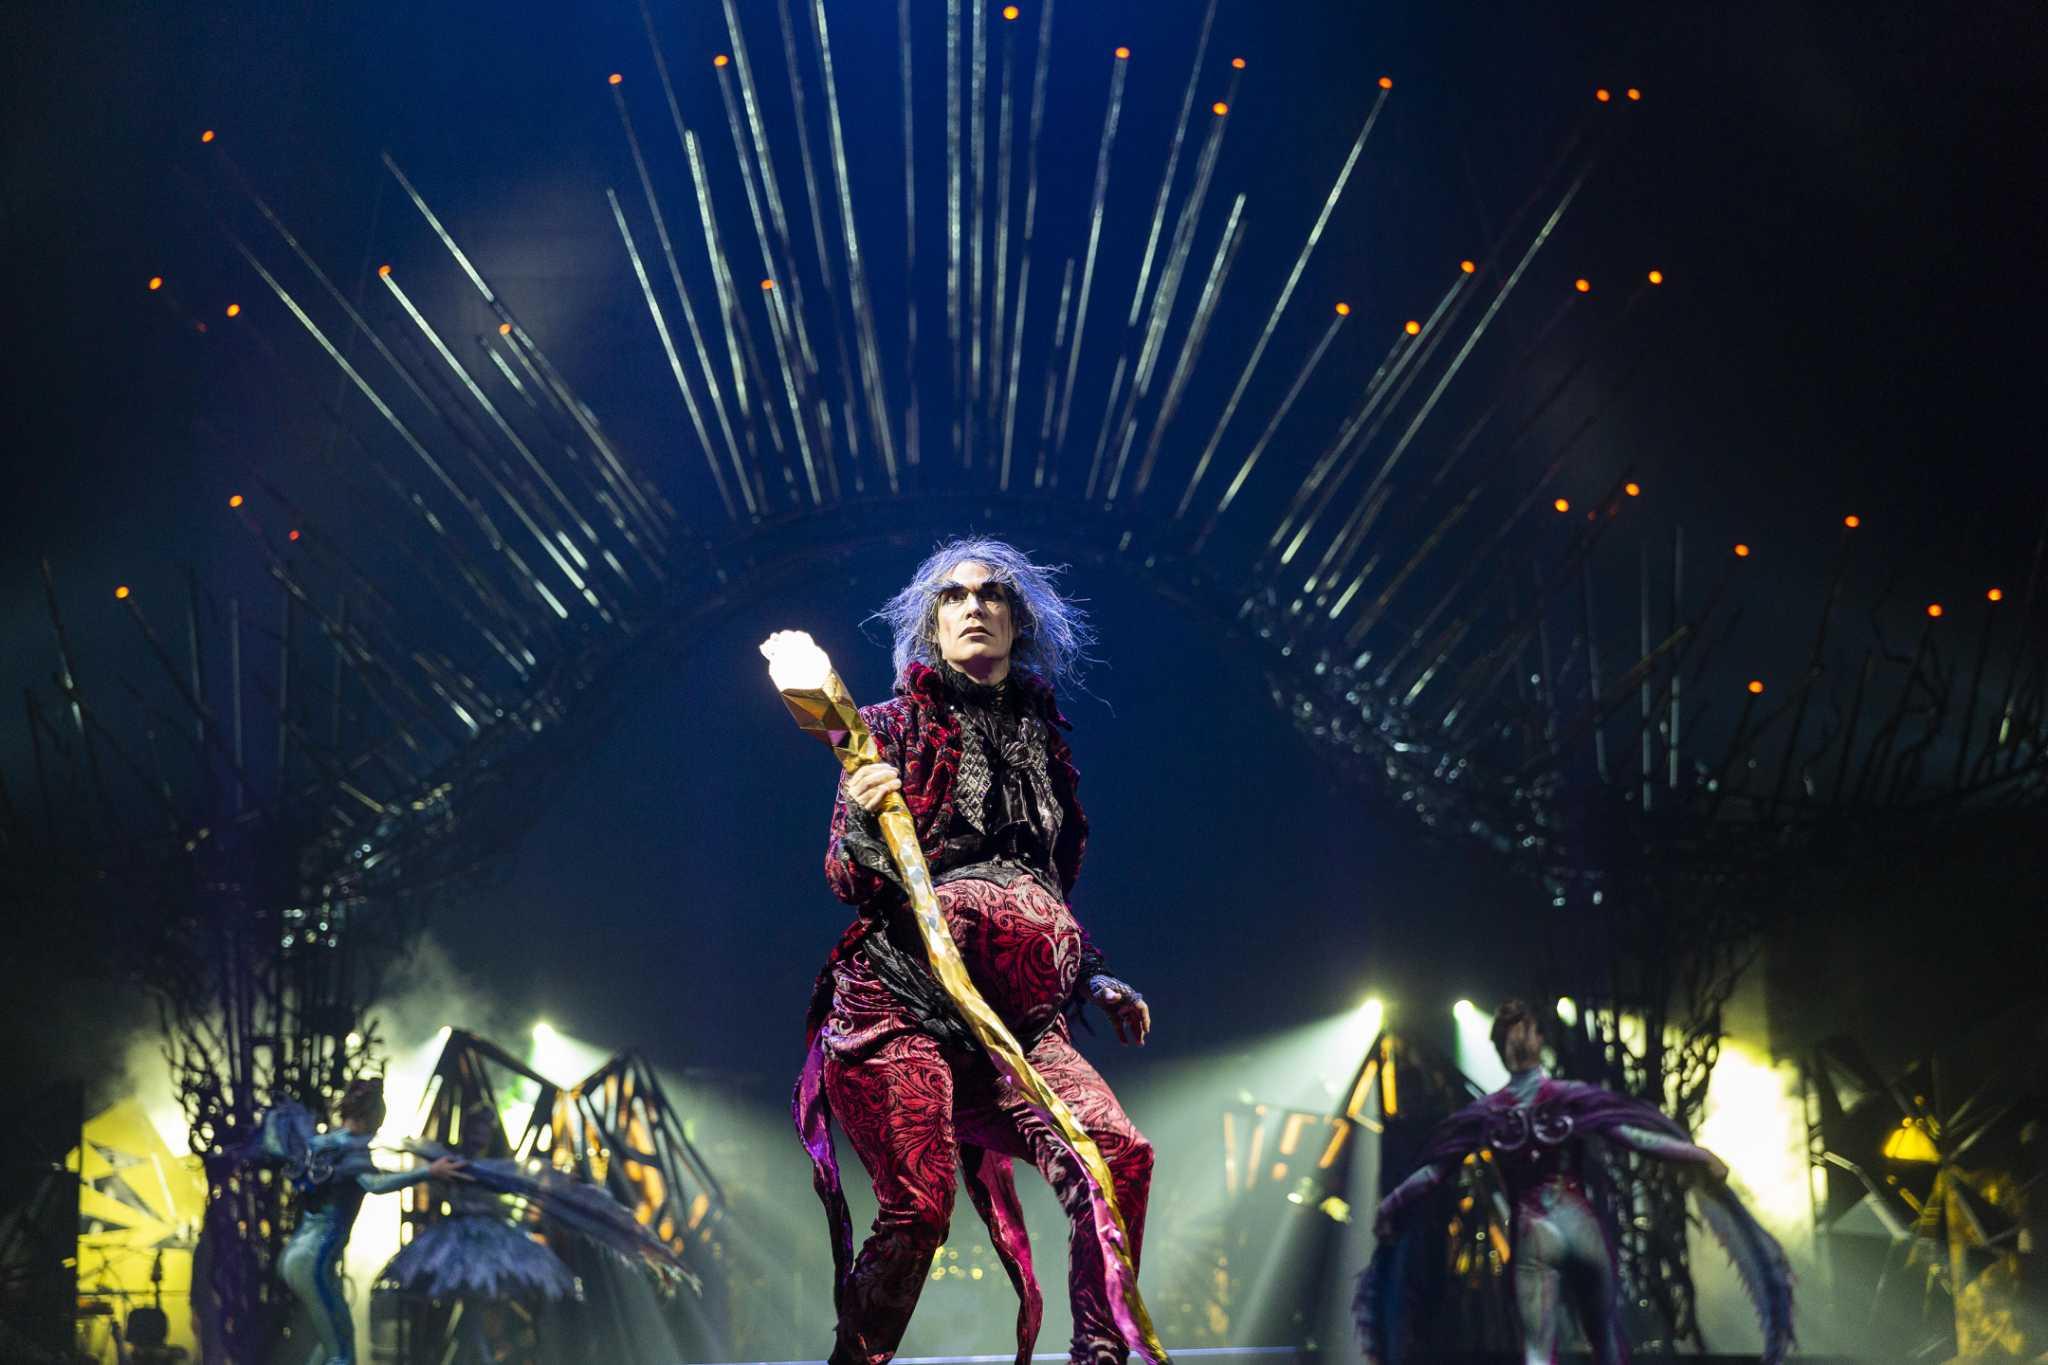 Cirque Du Soleil: Alegria to combine present, past